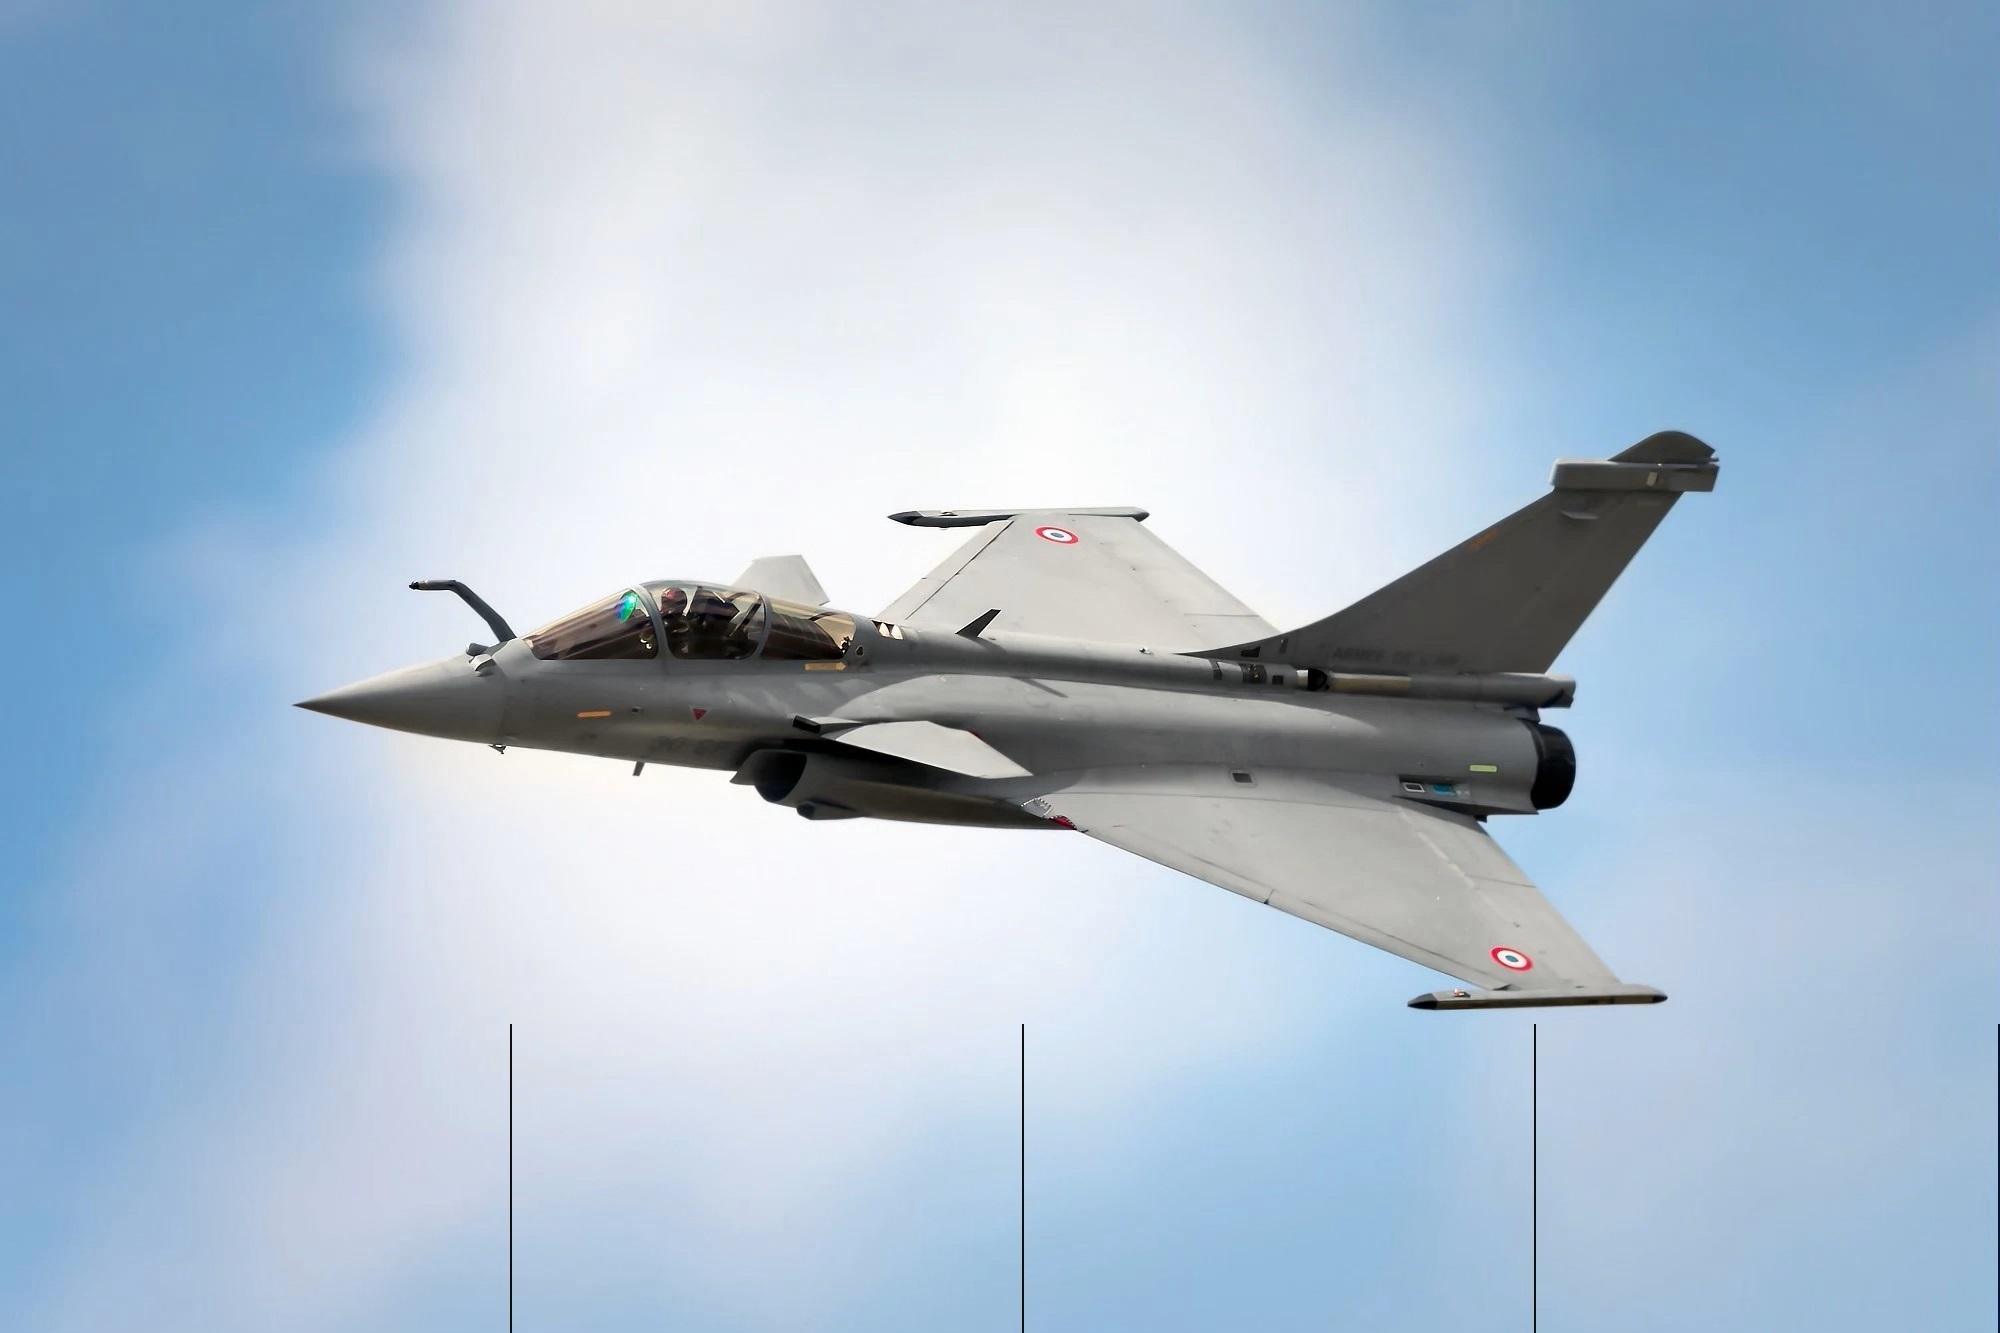 Croatian Air Force Selects Dassault Rafale Multirole Fighter